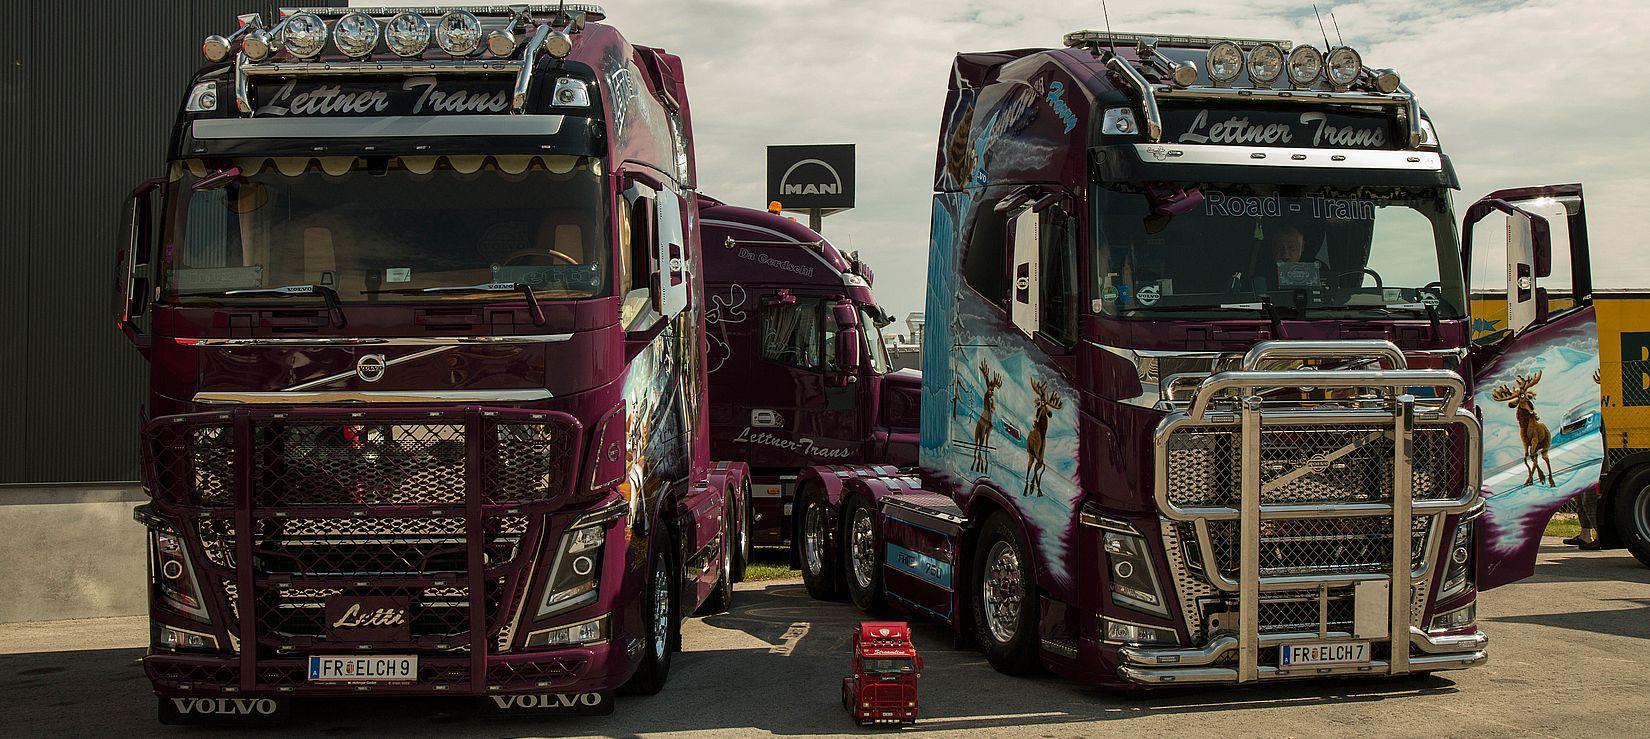 http://www.lkw-thorsten.eu/wp-content/uploads/2017/02/TRUCKMO.com_Truck_Event_Austria79.jpg